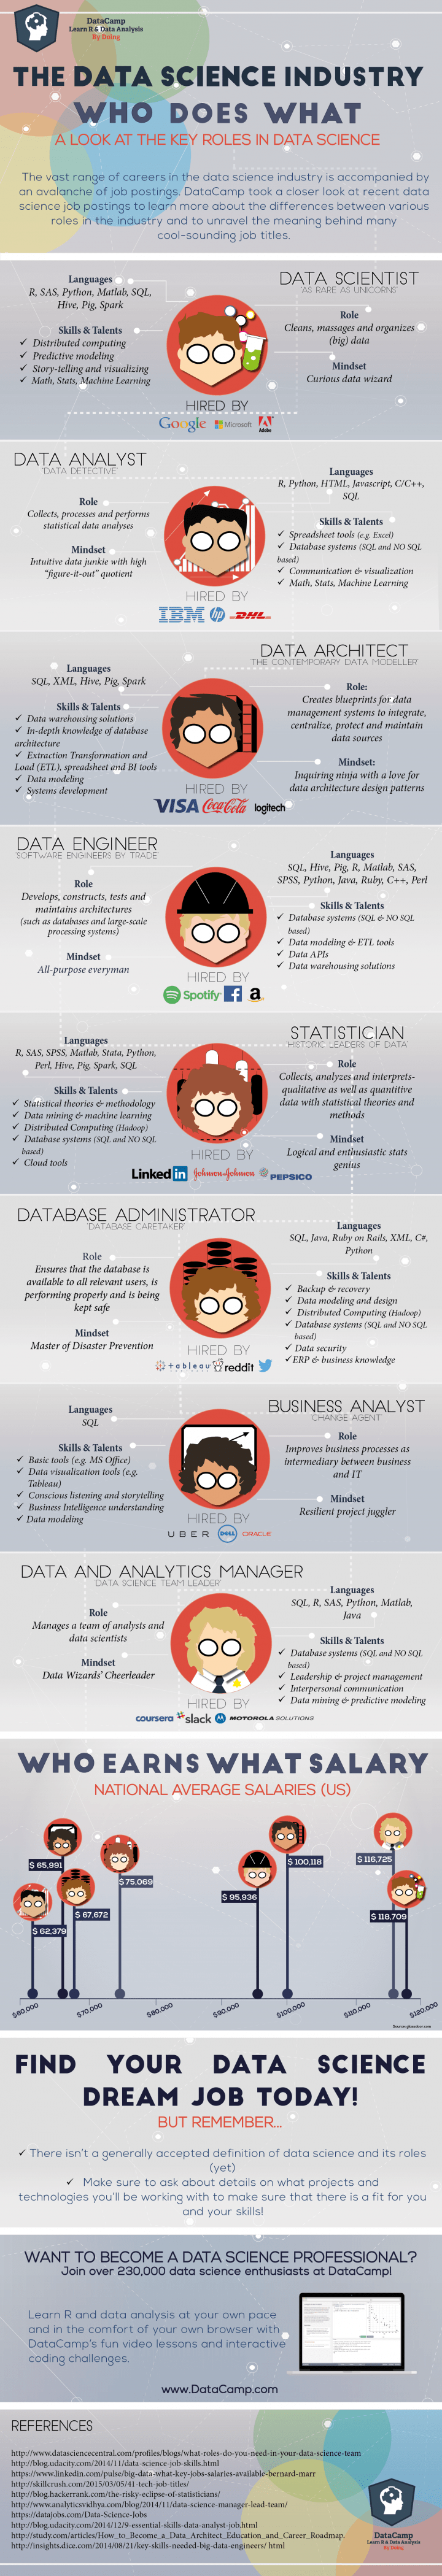 Data Scientist infographic